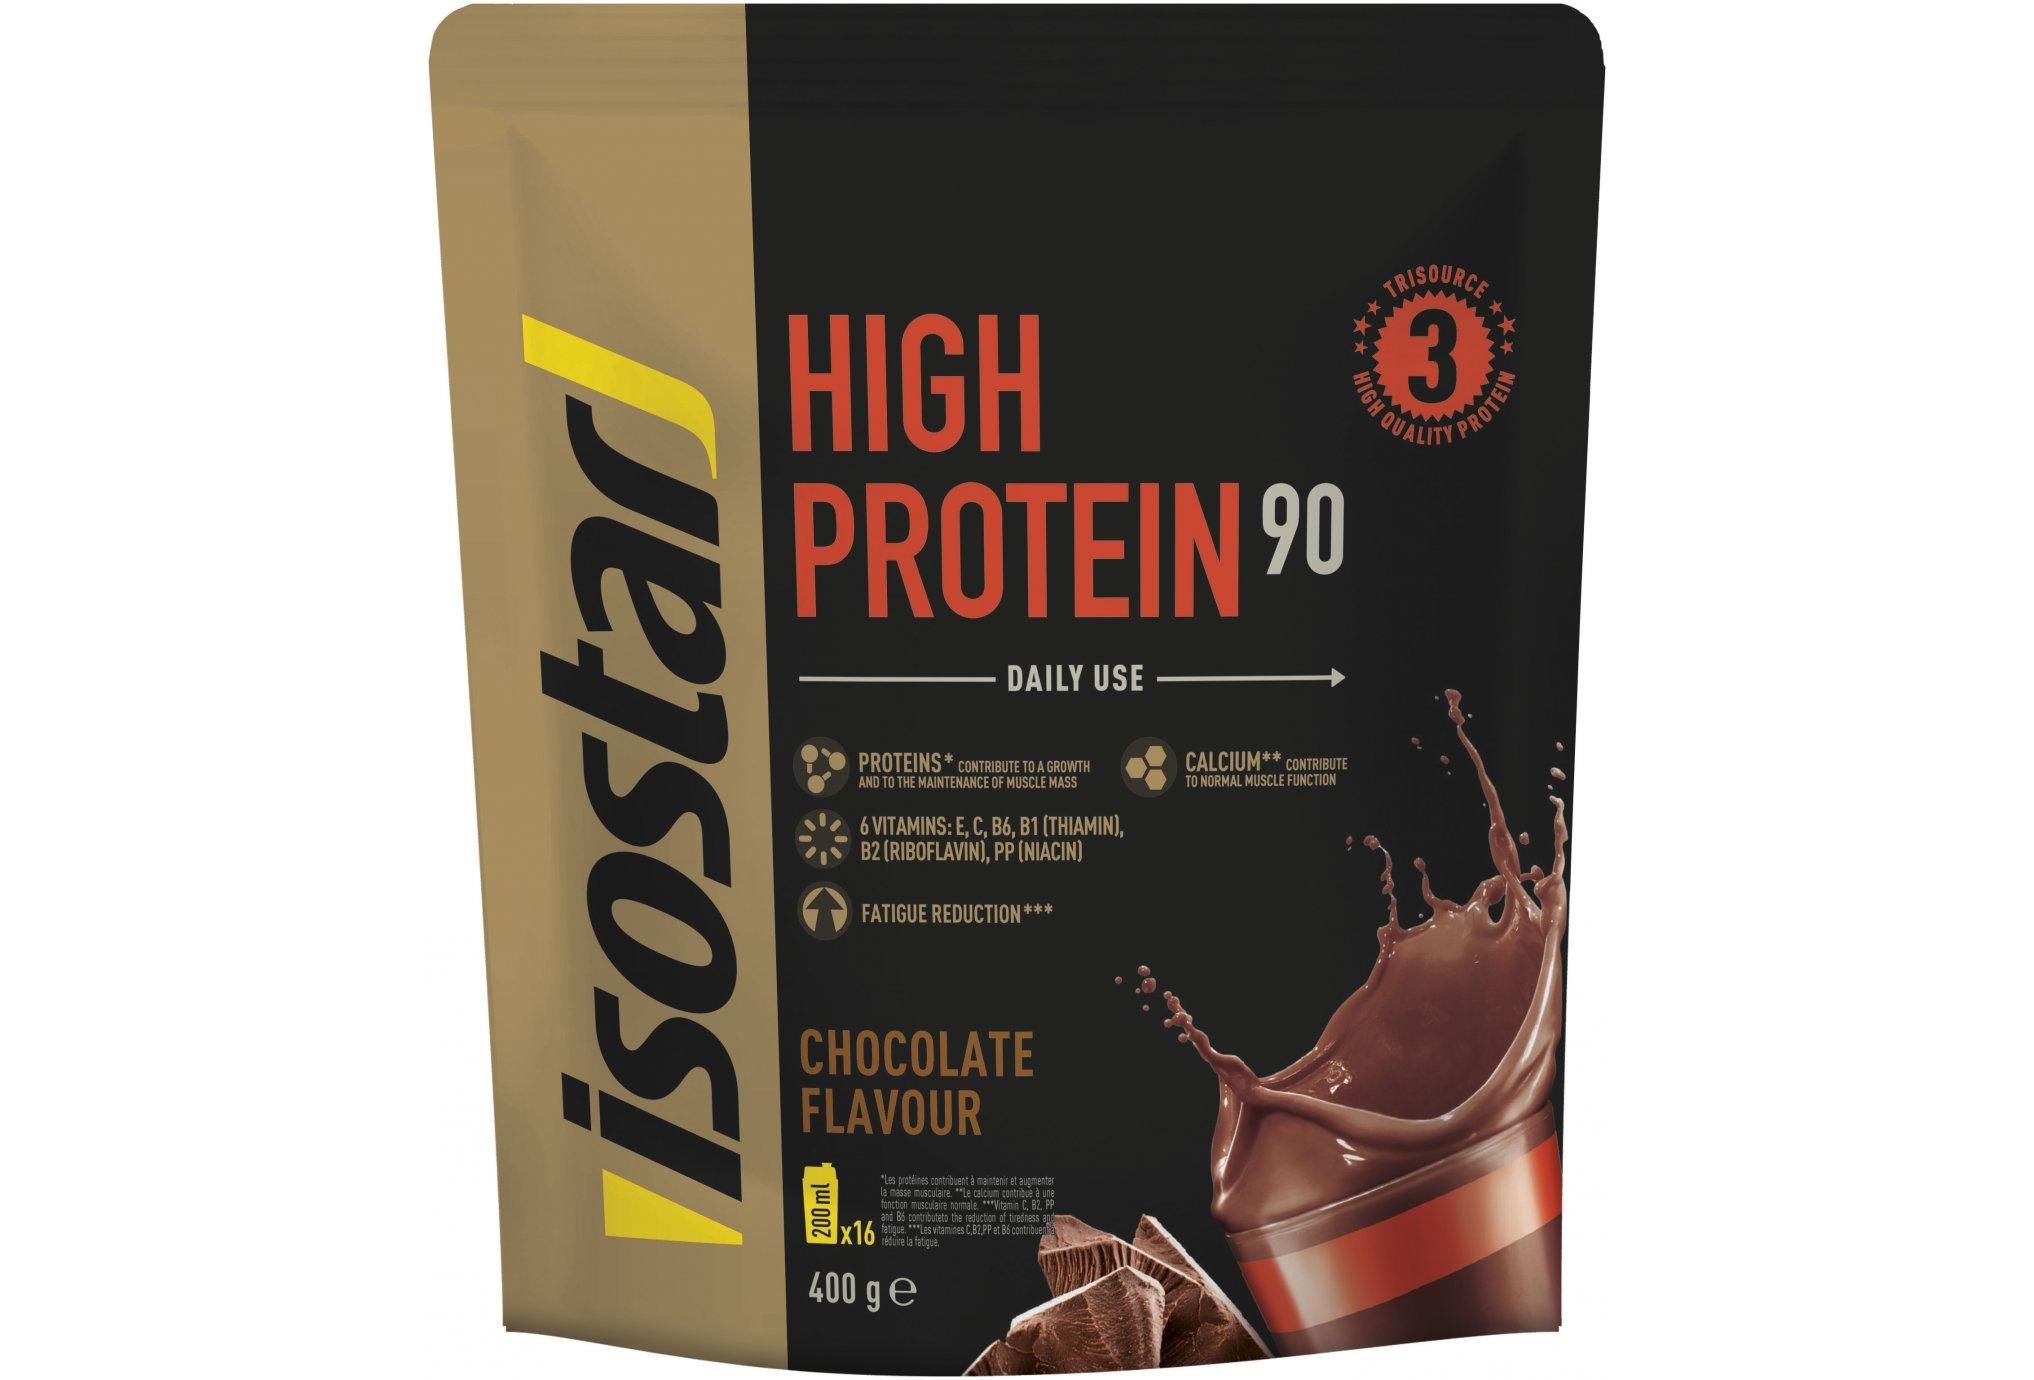 Isostar High Protein 90 - Chocolat Diététique Protéines / récupération